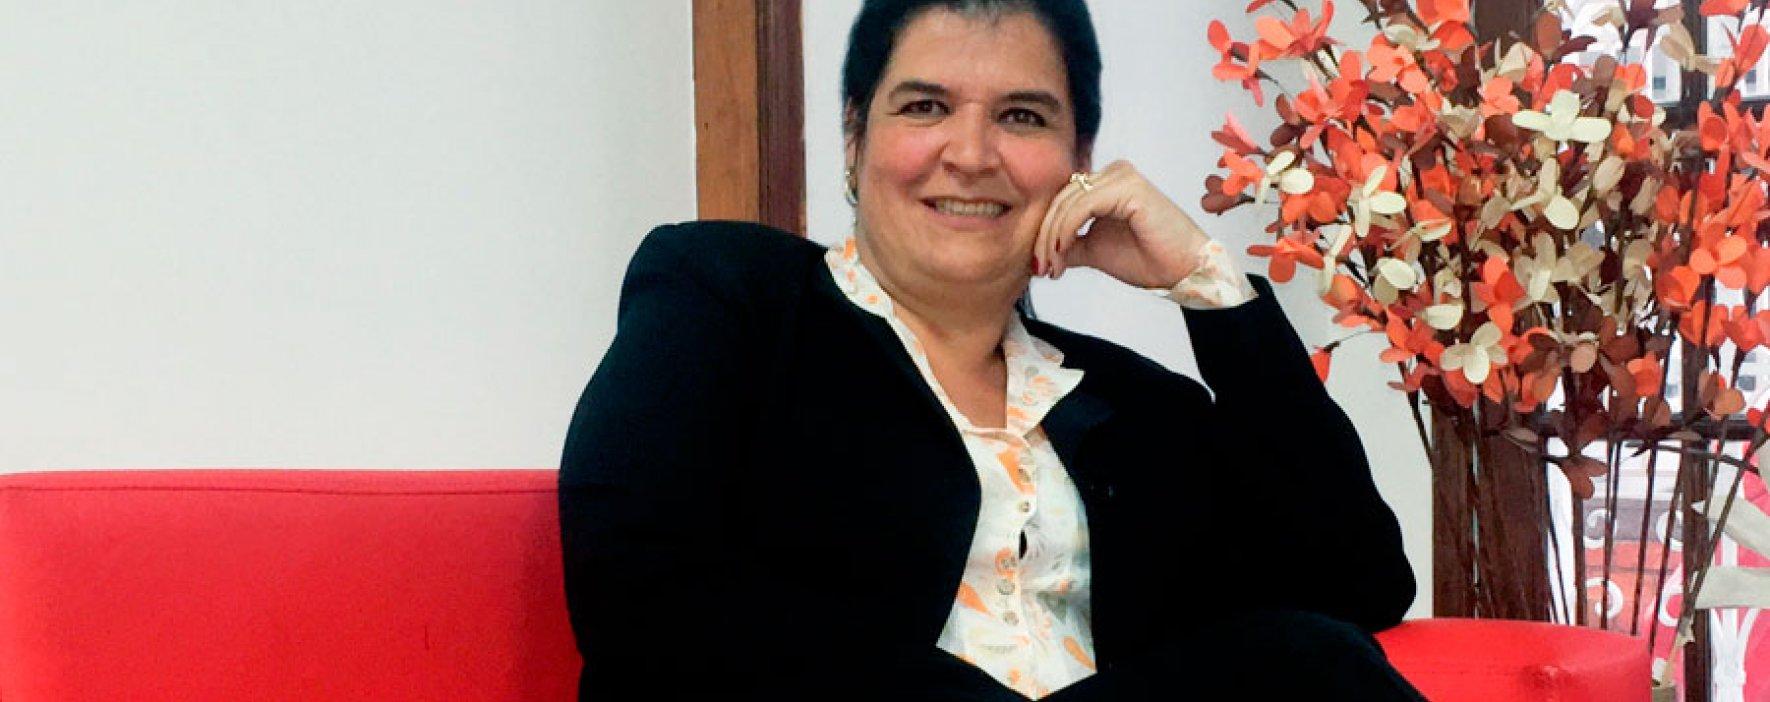 Sonia González: una profe ejemplar